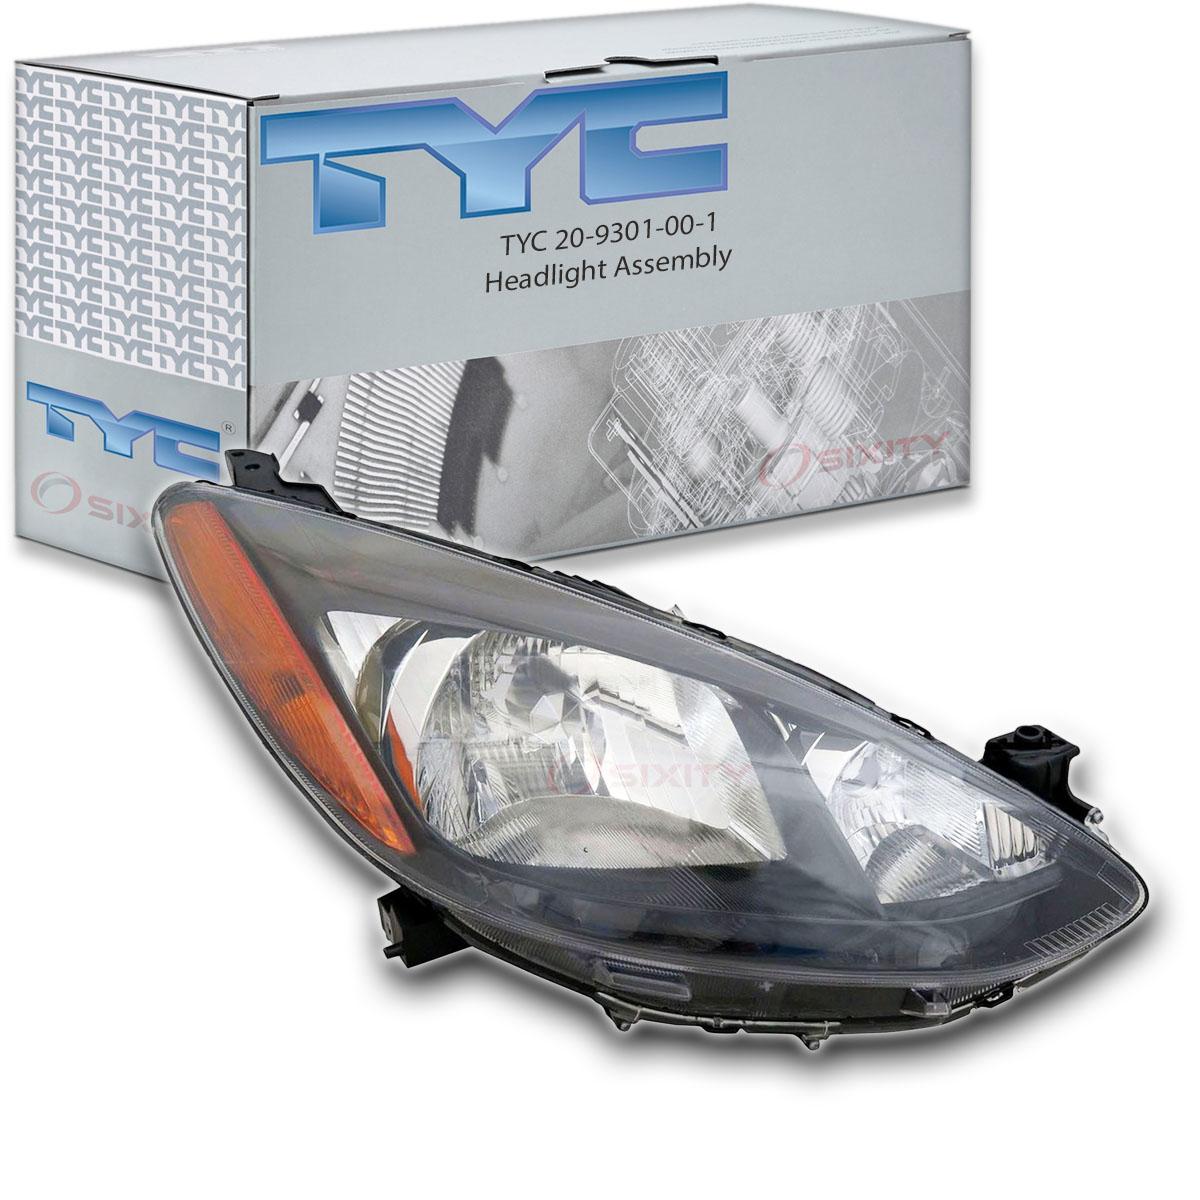 TYC-20-9301-00-1-Headlight-Assembly-for-Mazda-DR61-51-0K0D-ub